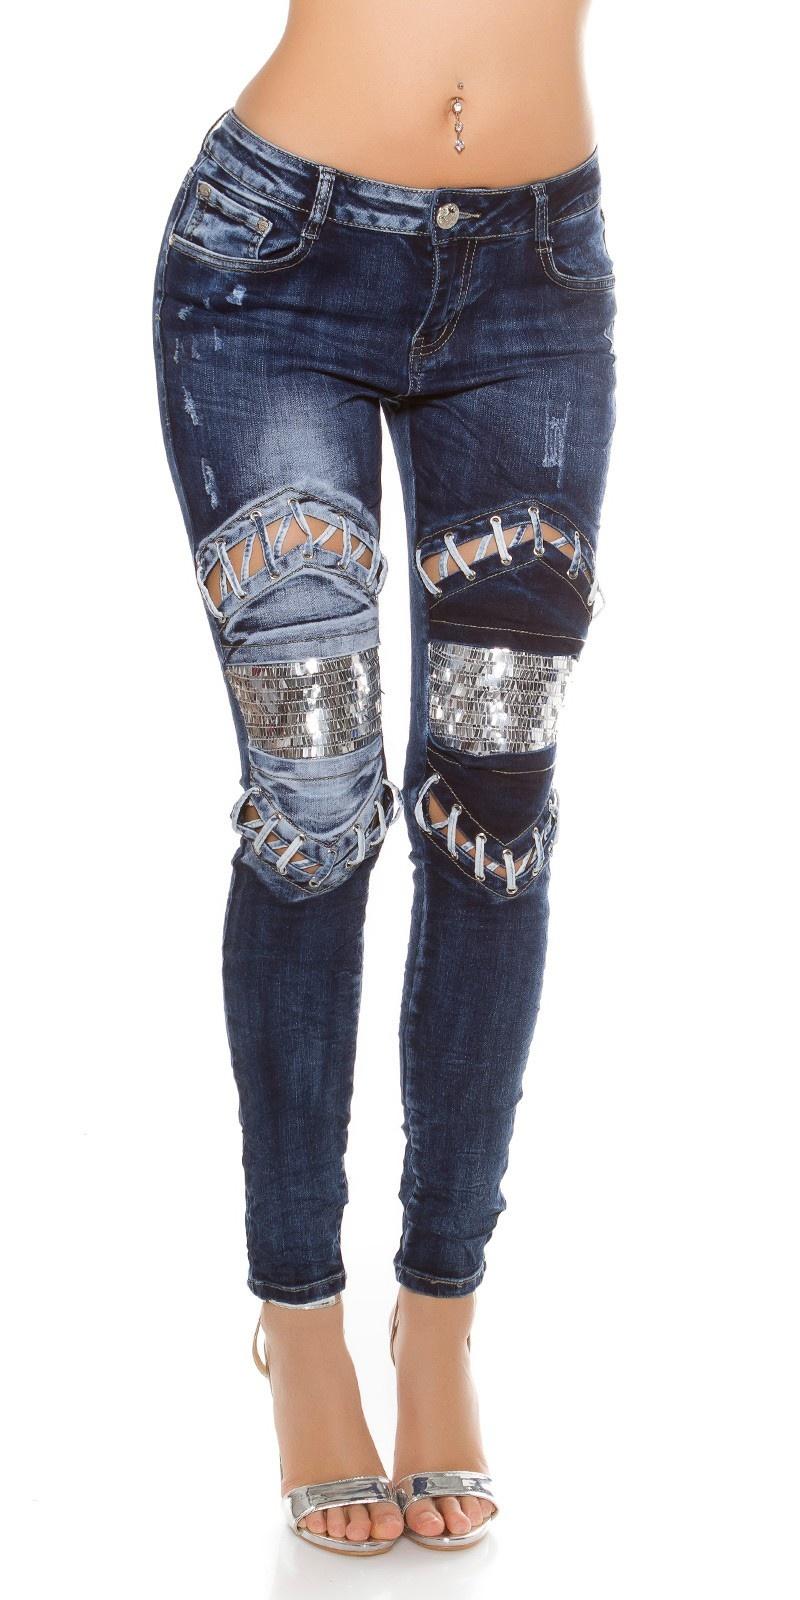 Sexy skinny jeans gebruikte used look met pailletten & veter jeansblauw